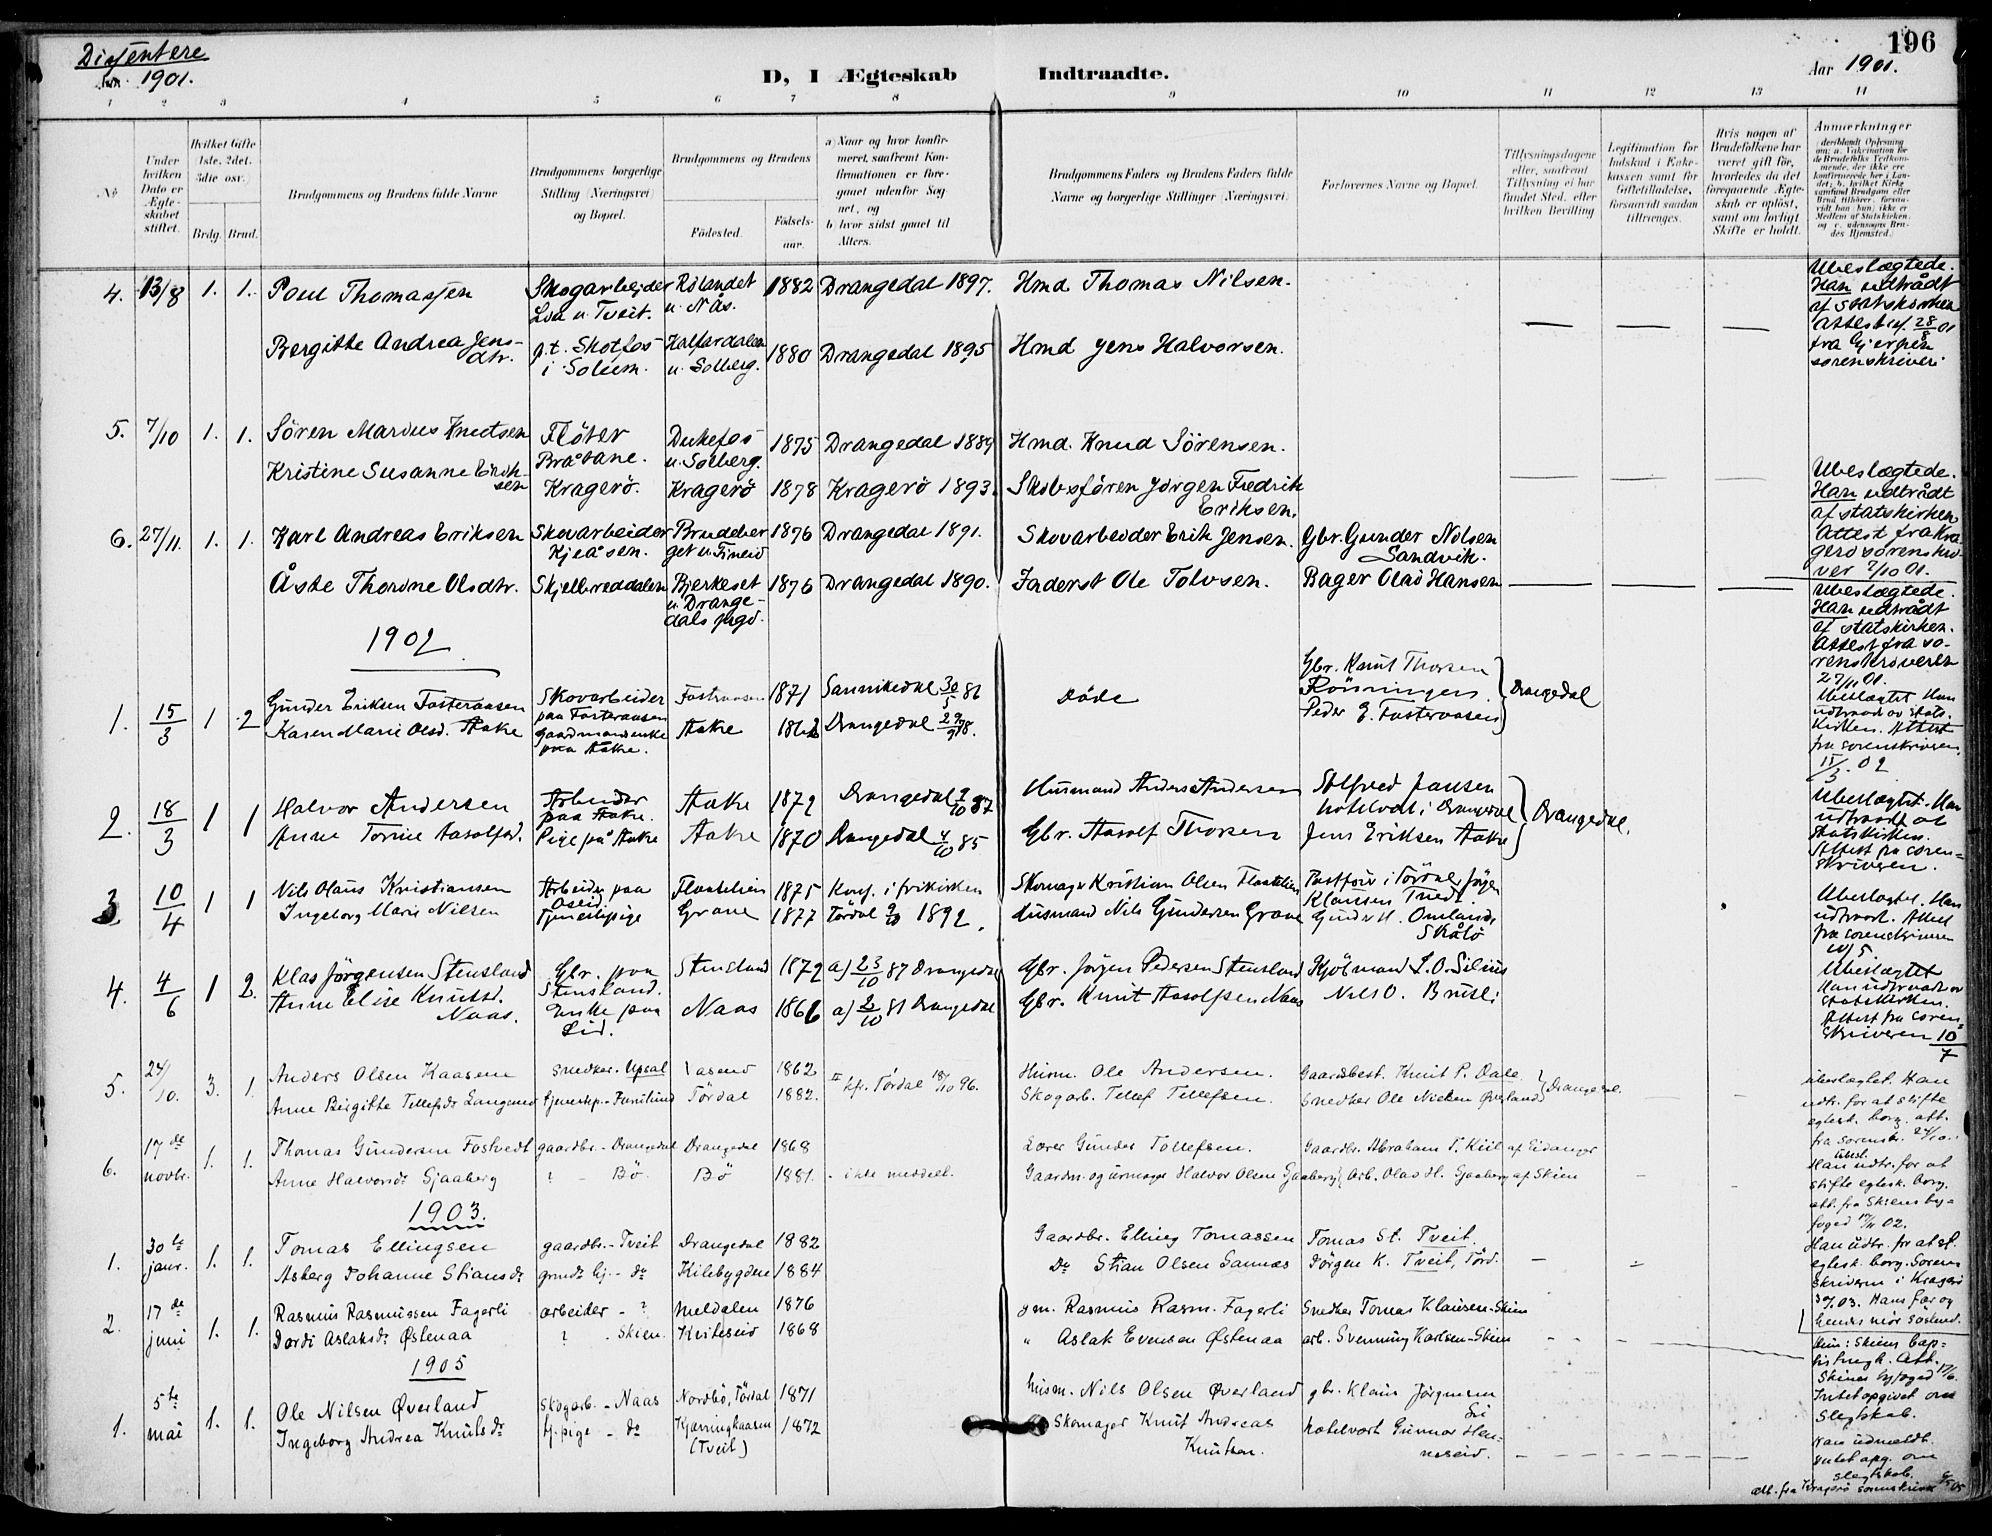 SAKO, Drangedal kirkebøker, F/Fa/L0012: Ministerialbok nr. 12, 1895-1905, s. 196